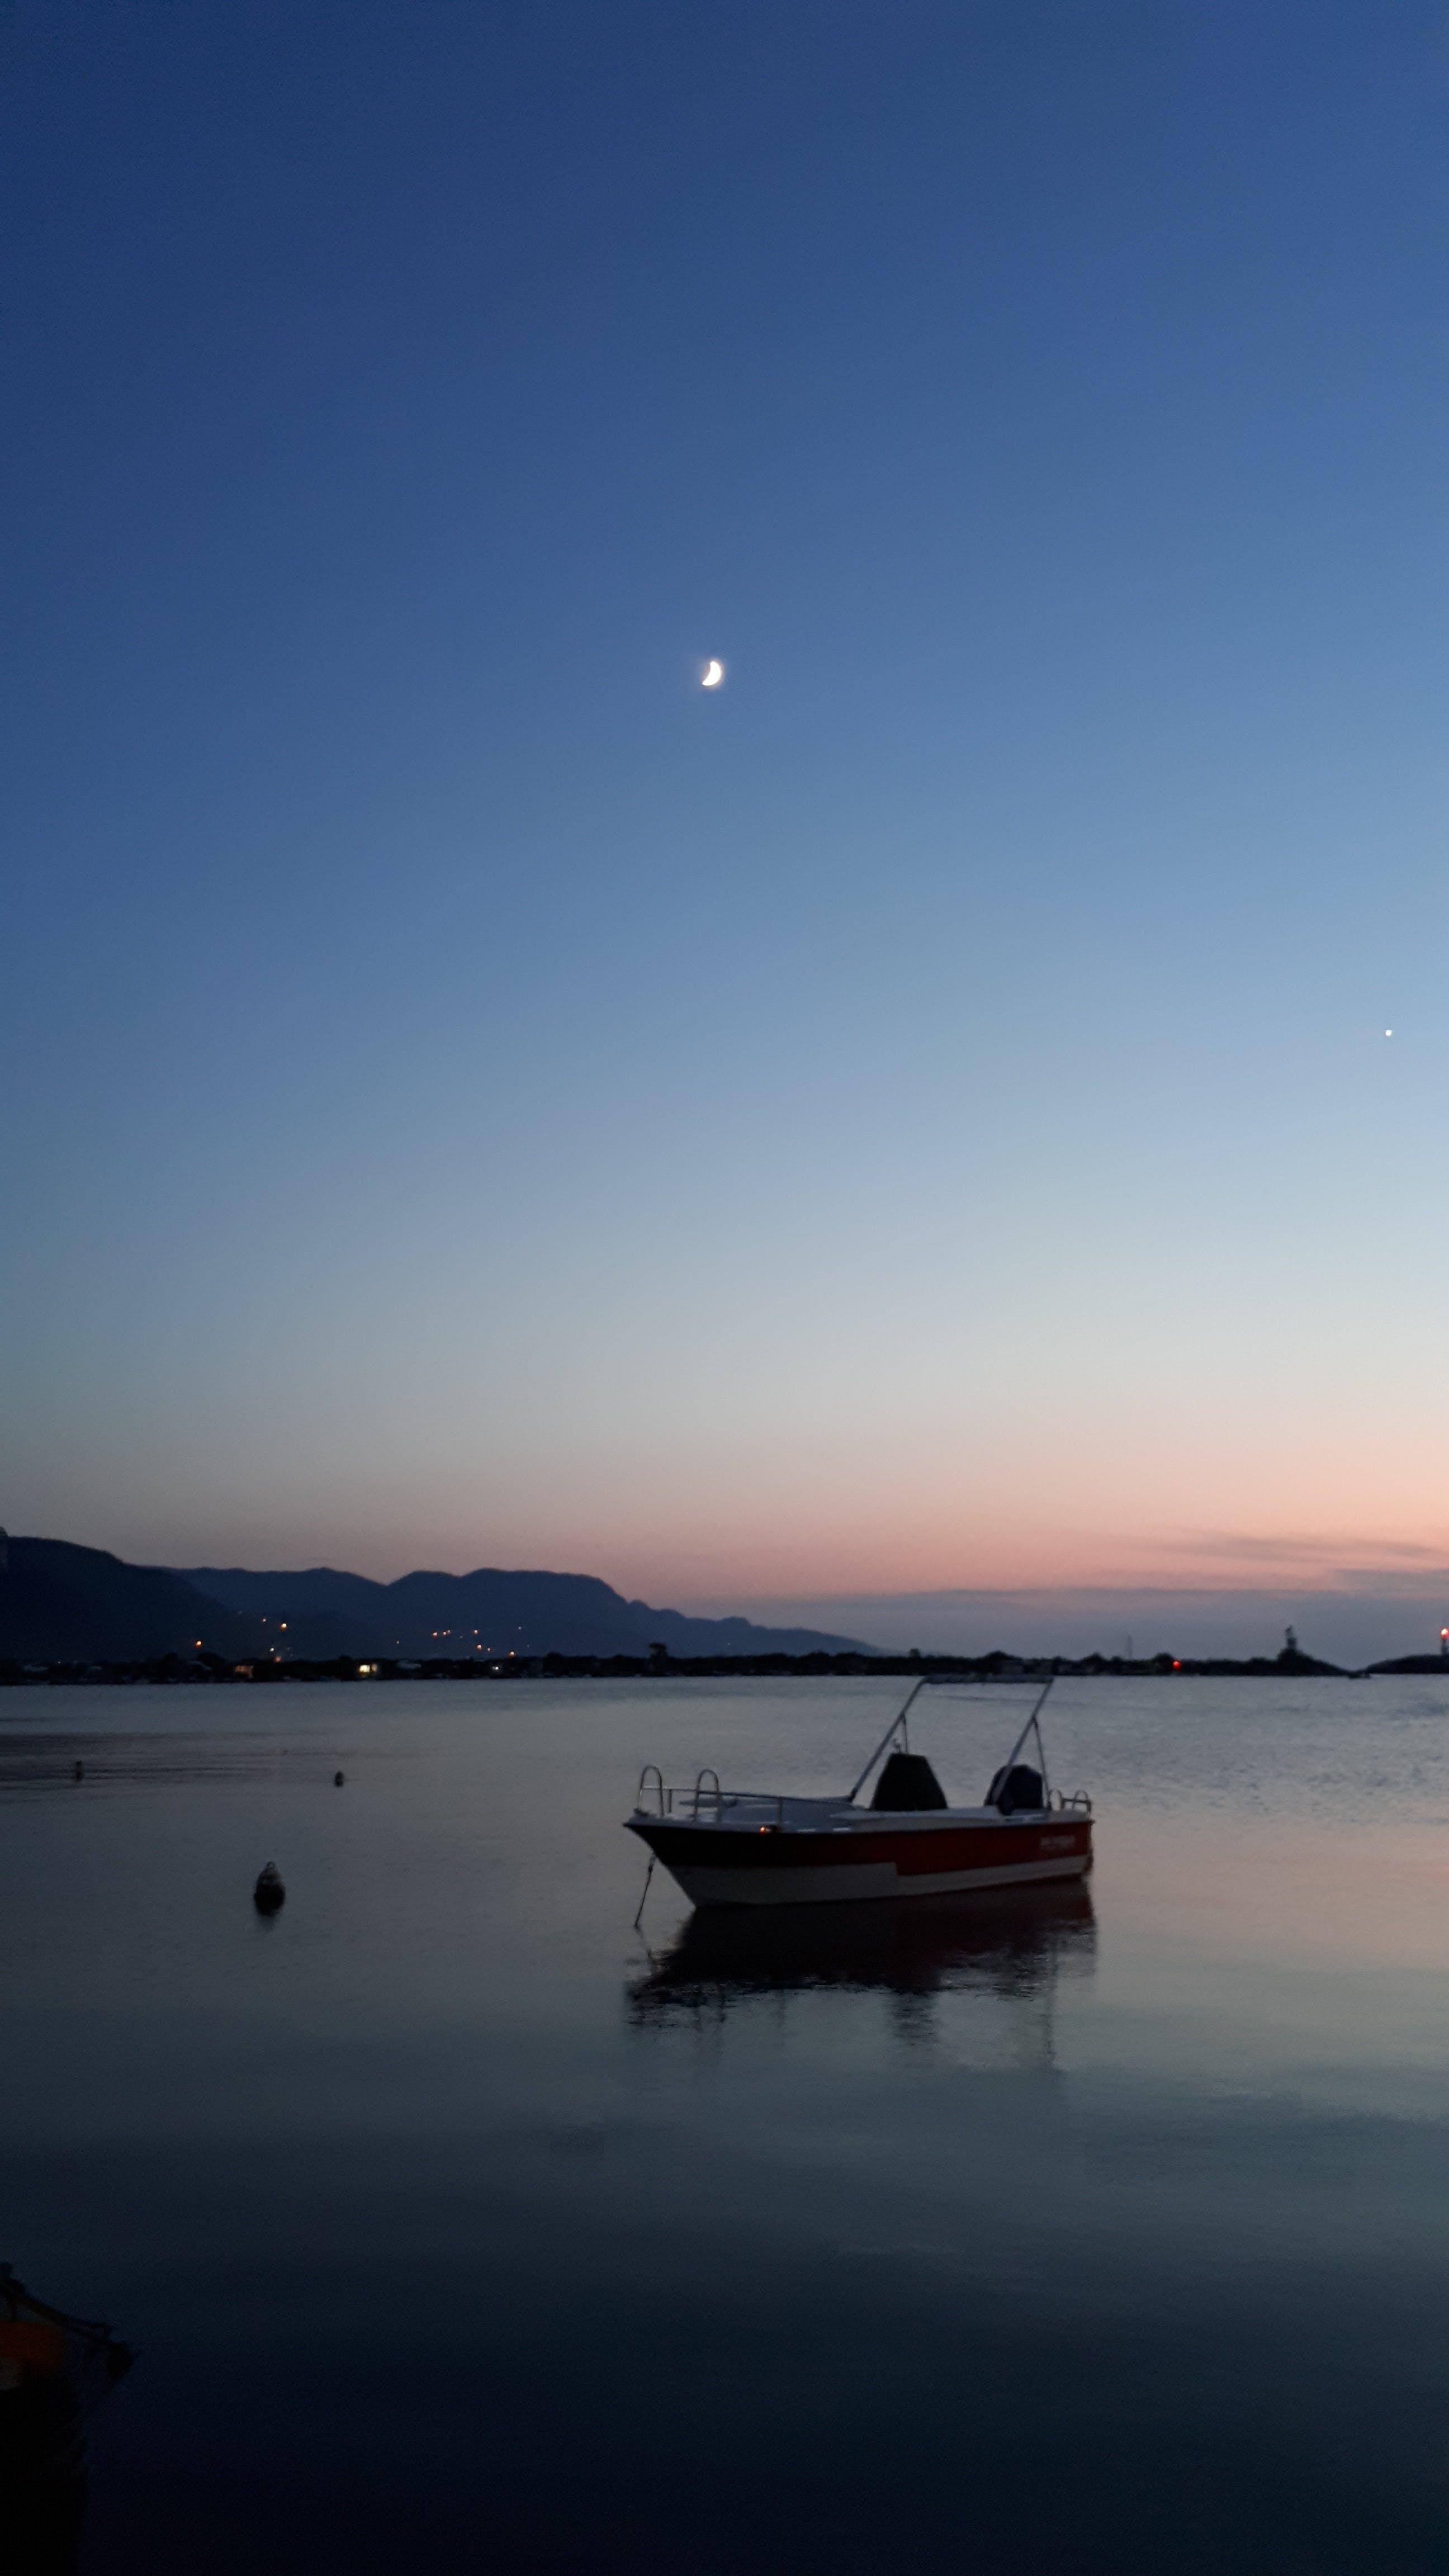 Free stock photo of blacksea, boat, calm, calm waters